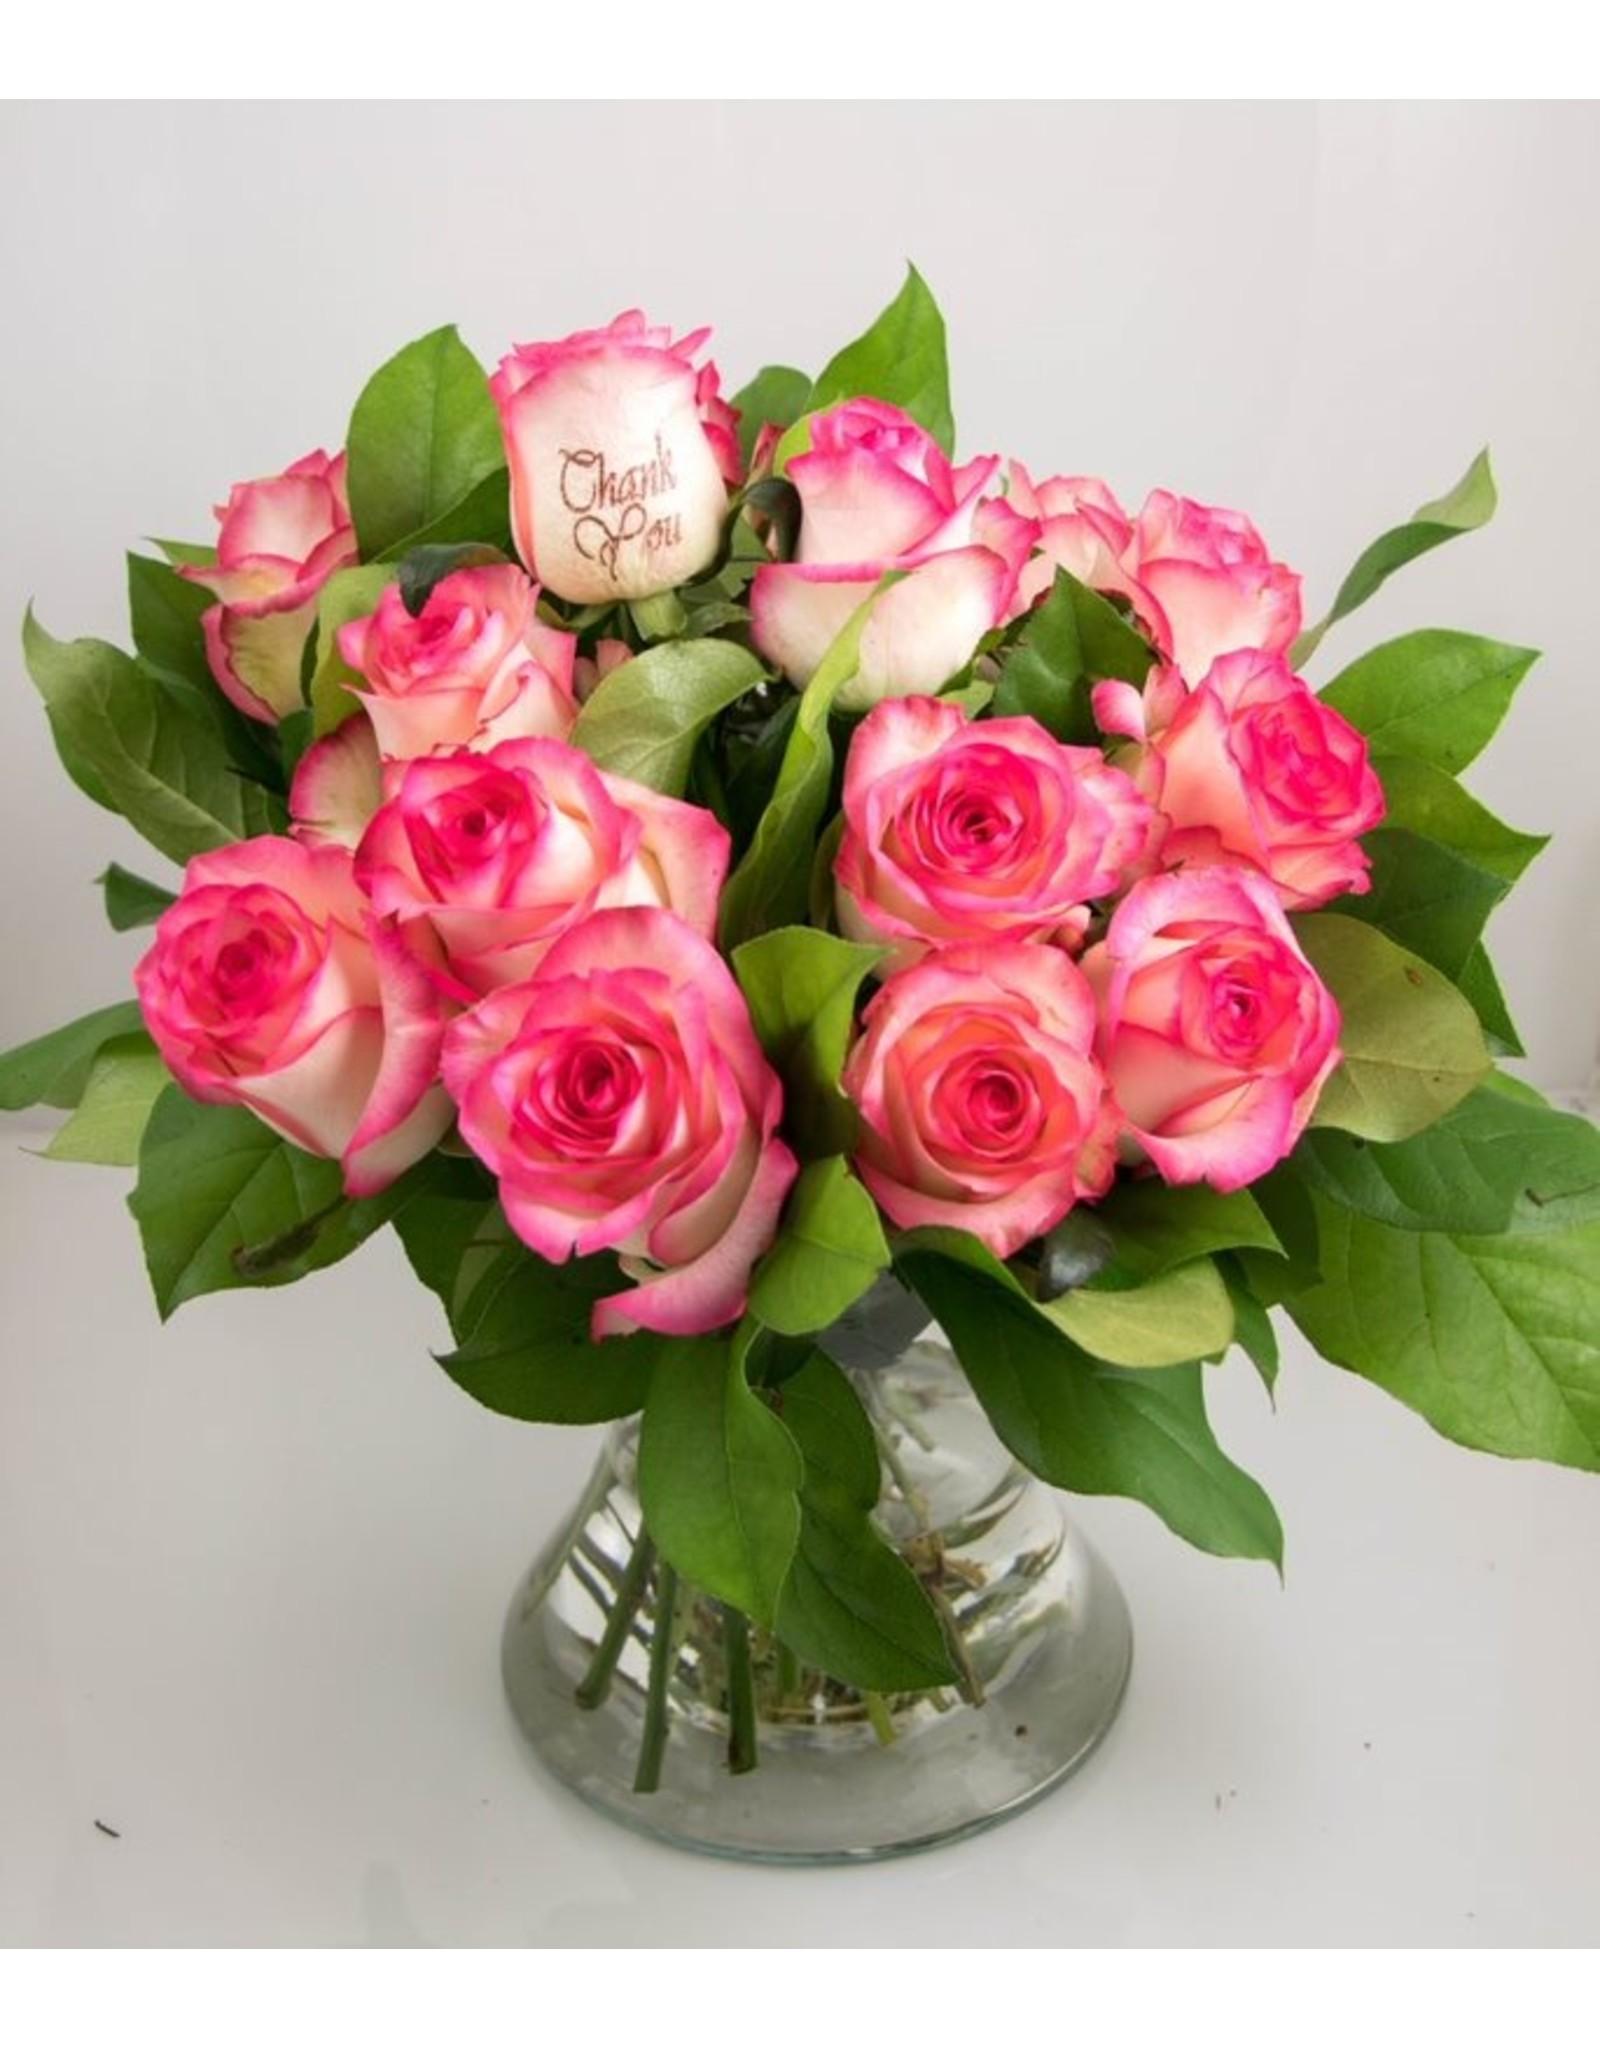 Magic Flowers Boeket 15 rozen - Wit/Roze - Thank you